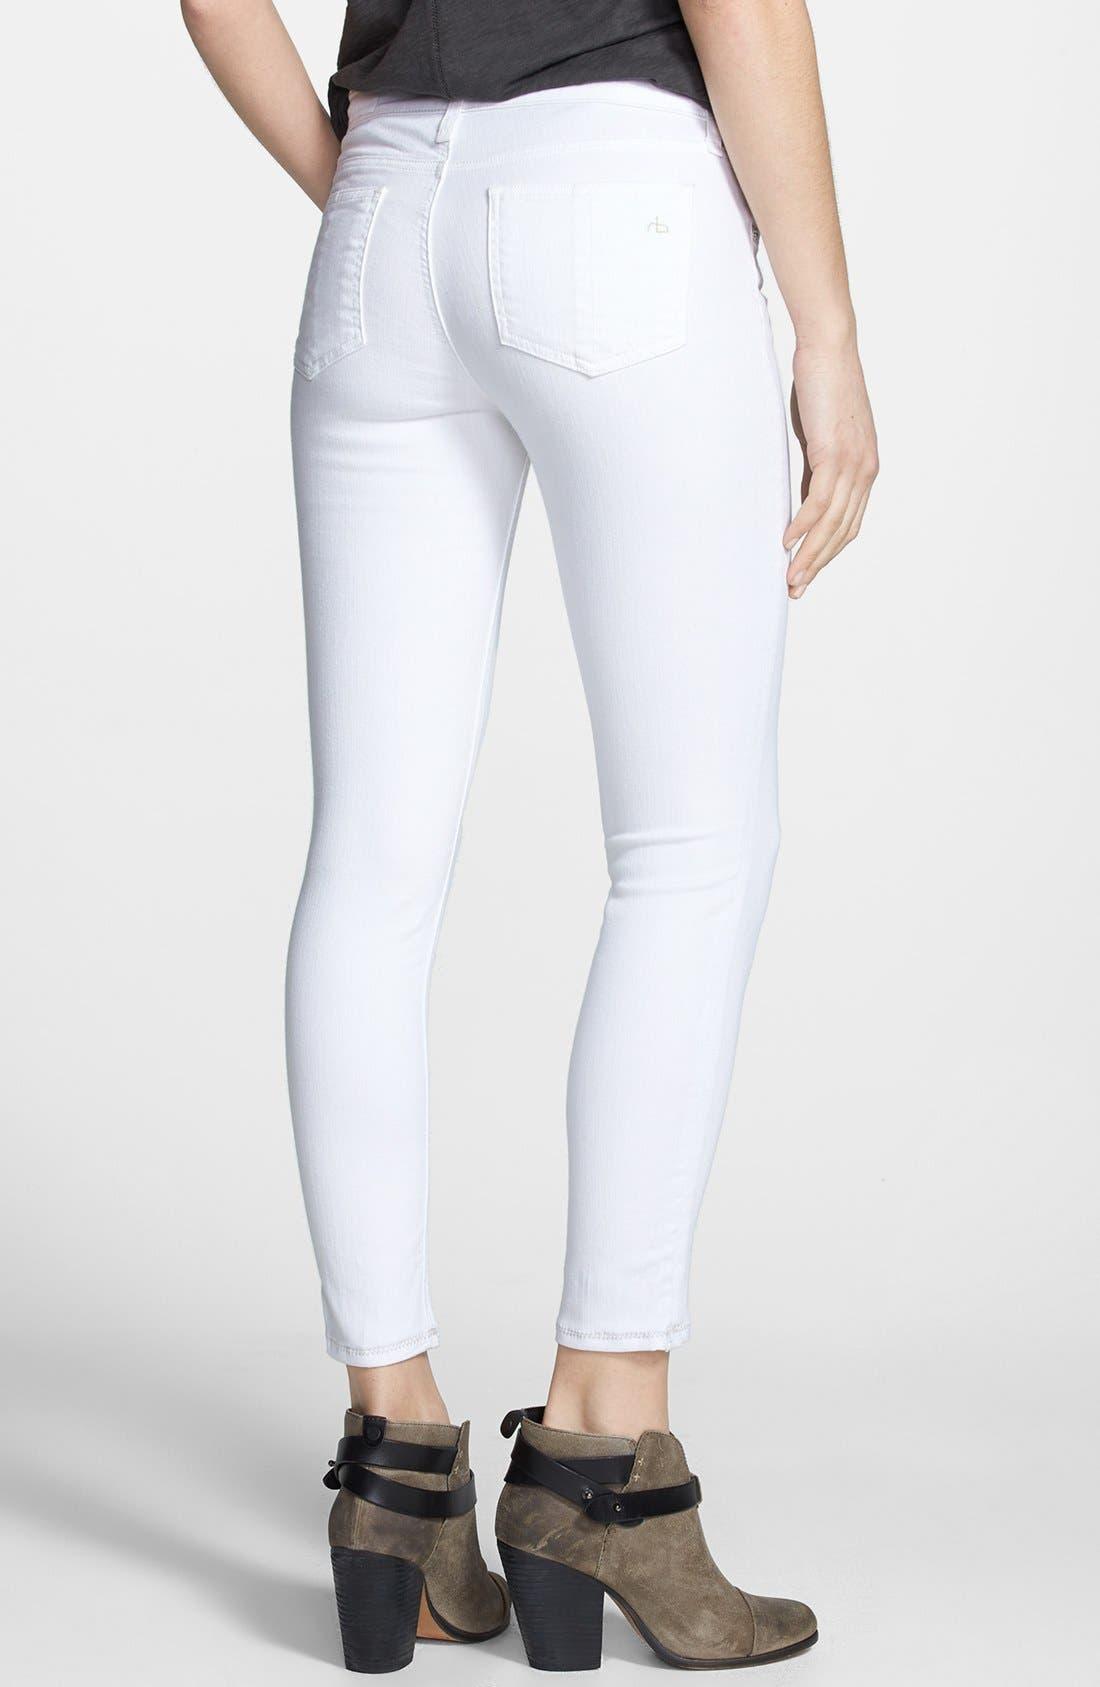 Alternate Image 2  - rag & bone/JEAN 'Repair' Skinny Crop Jeans (Bright White)